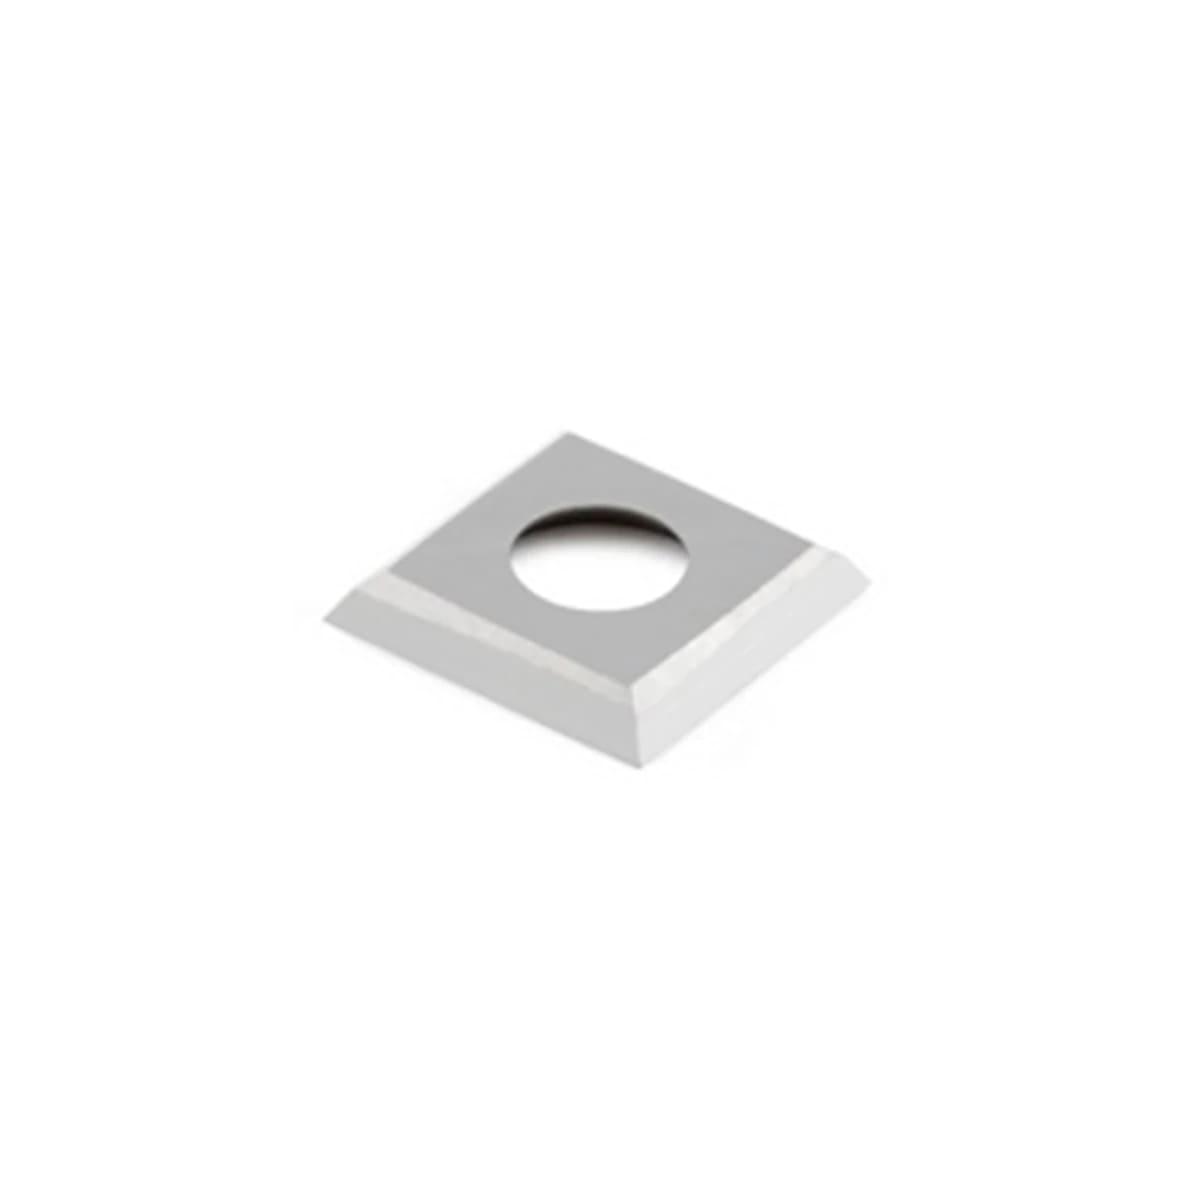 Inserto Pastilha De Videa Metal Duro 15 X 15 X 2,5 FEPAM Kit com 10 Peças